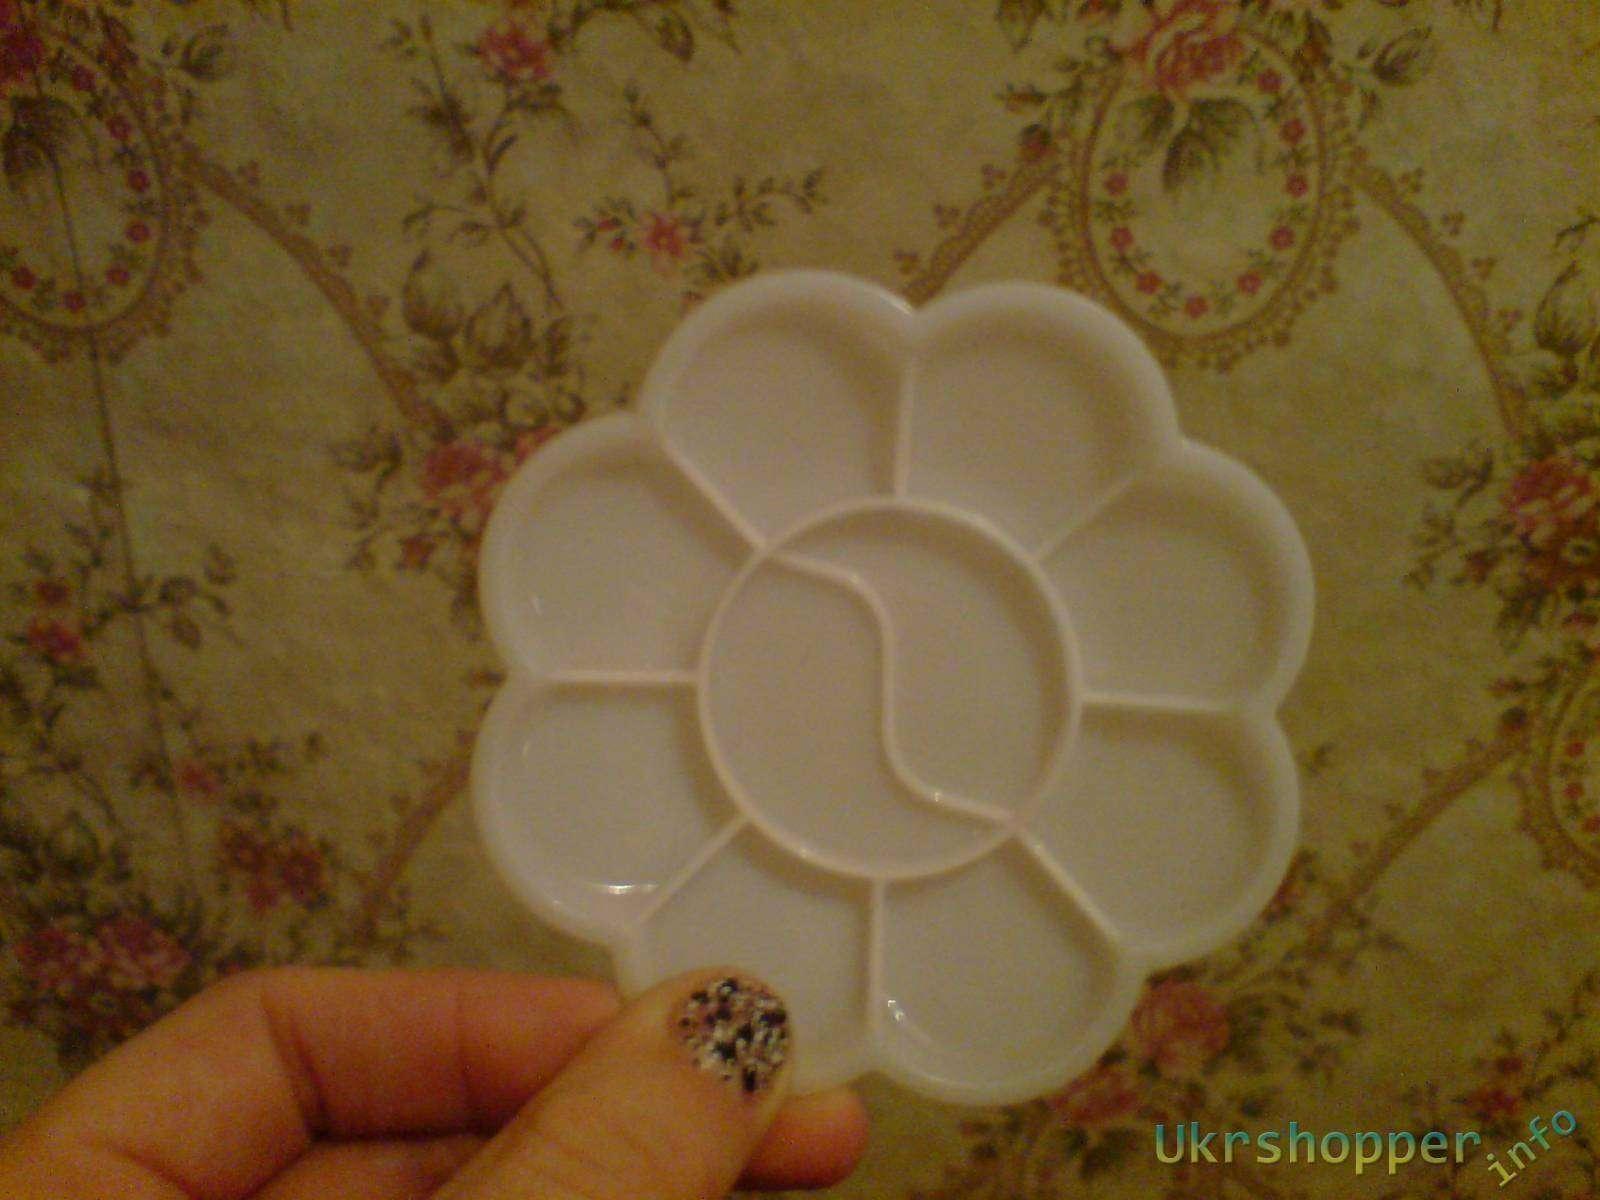 TinyDeal: Палитру для красок в виде цветочка. Flower Shape Color Mixing Palette Paint Plate Draw Palette Nail Art Dish - White HCI-149578